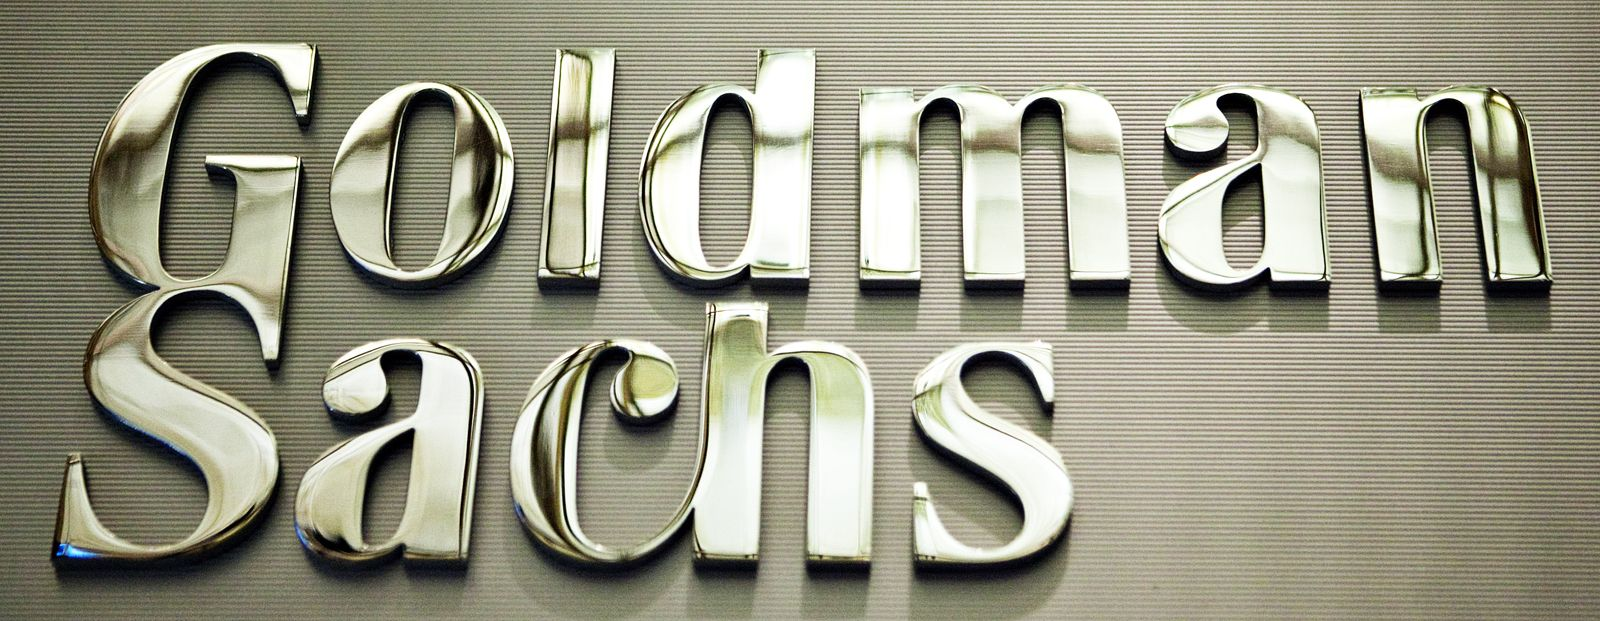 Goldman Sachs Logo history Logos, Investment quotes